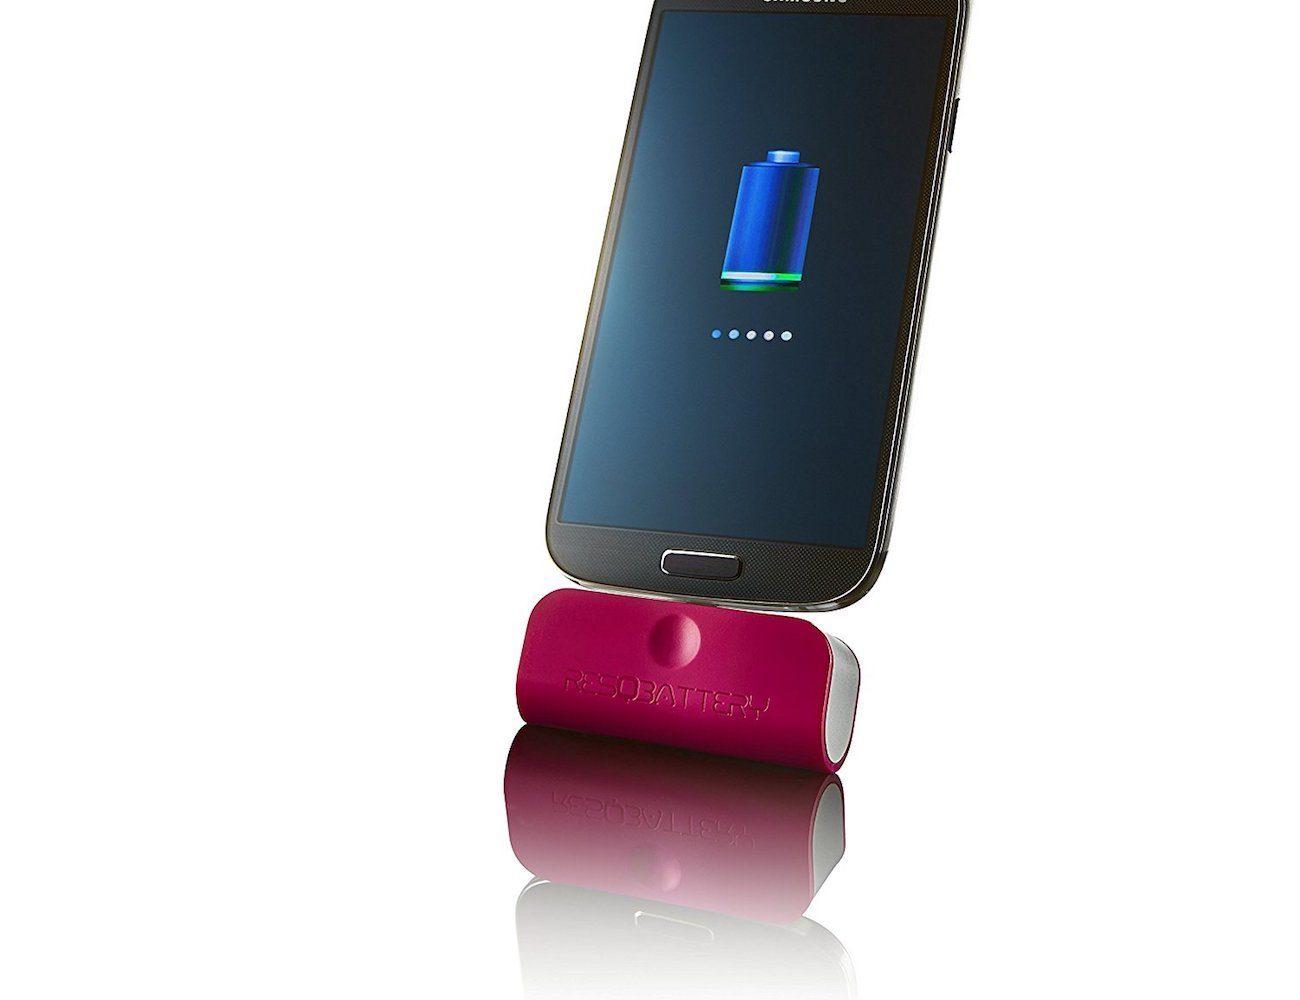 ResQBattery Smartphone Jumpstarter